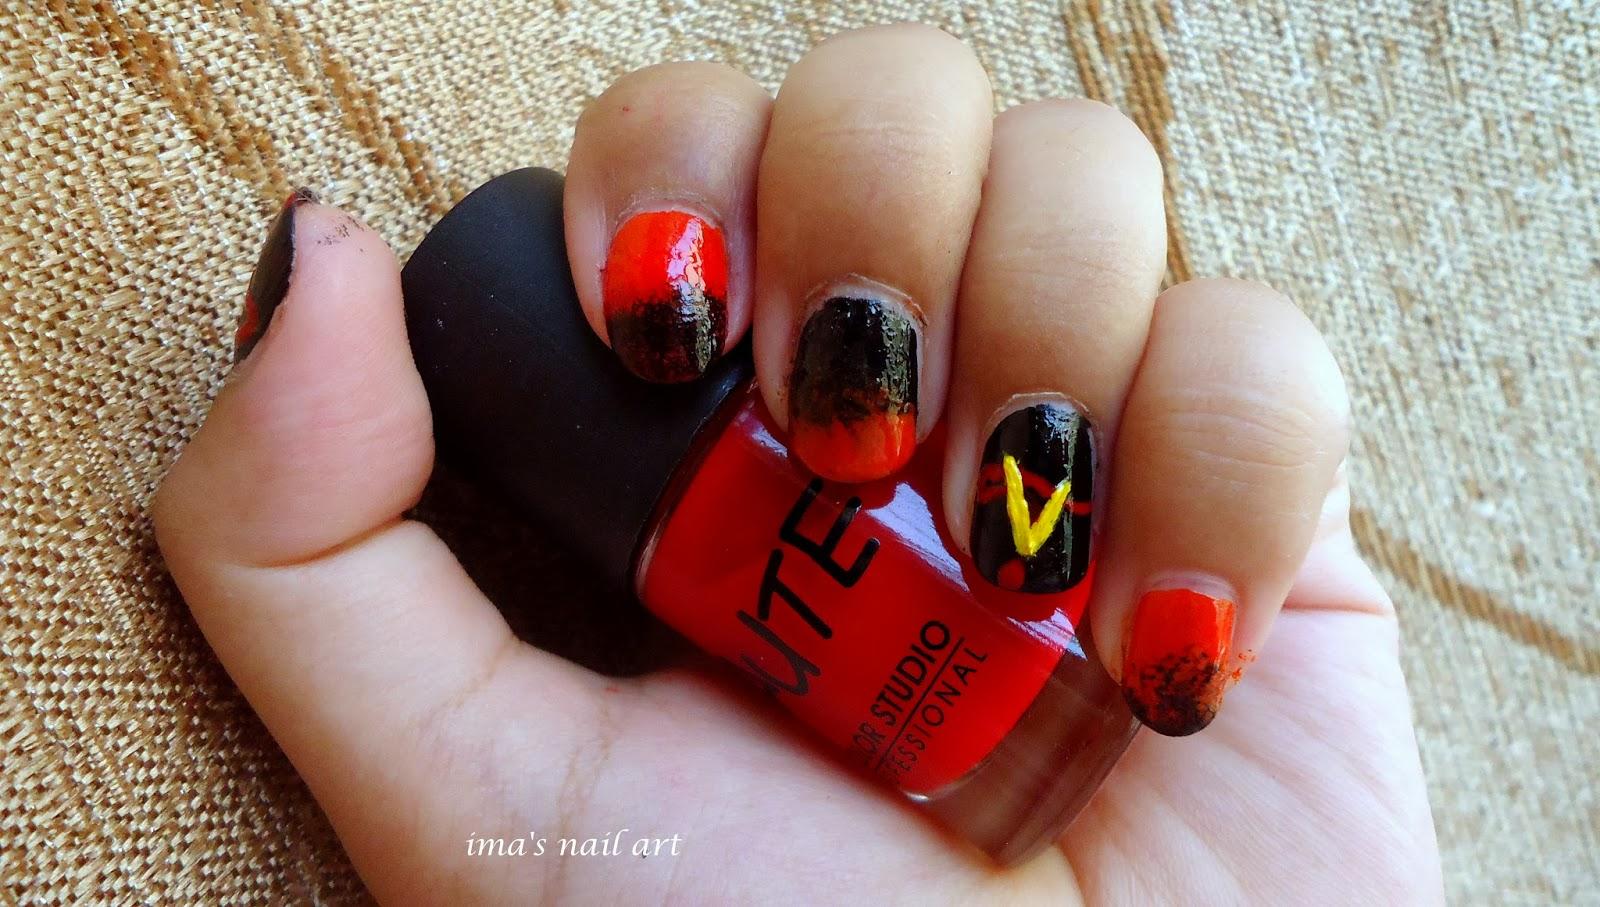 Ima\'s nail art: The Vampire Diaries nail art